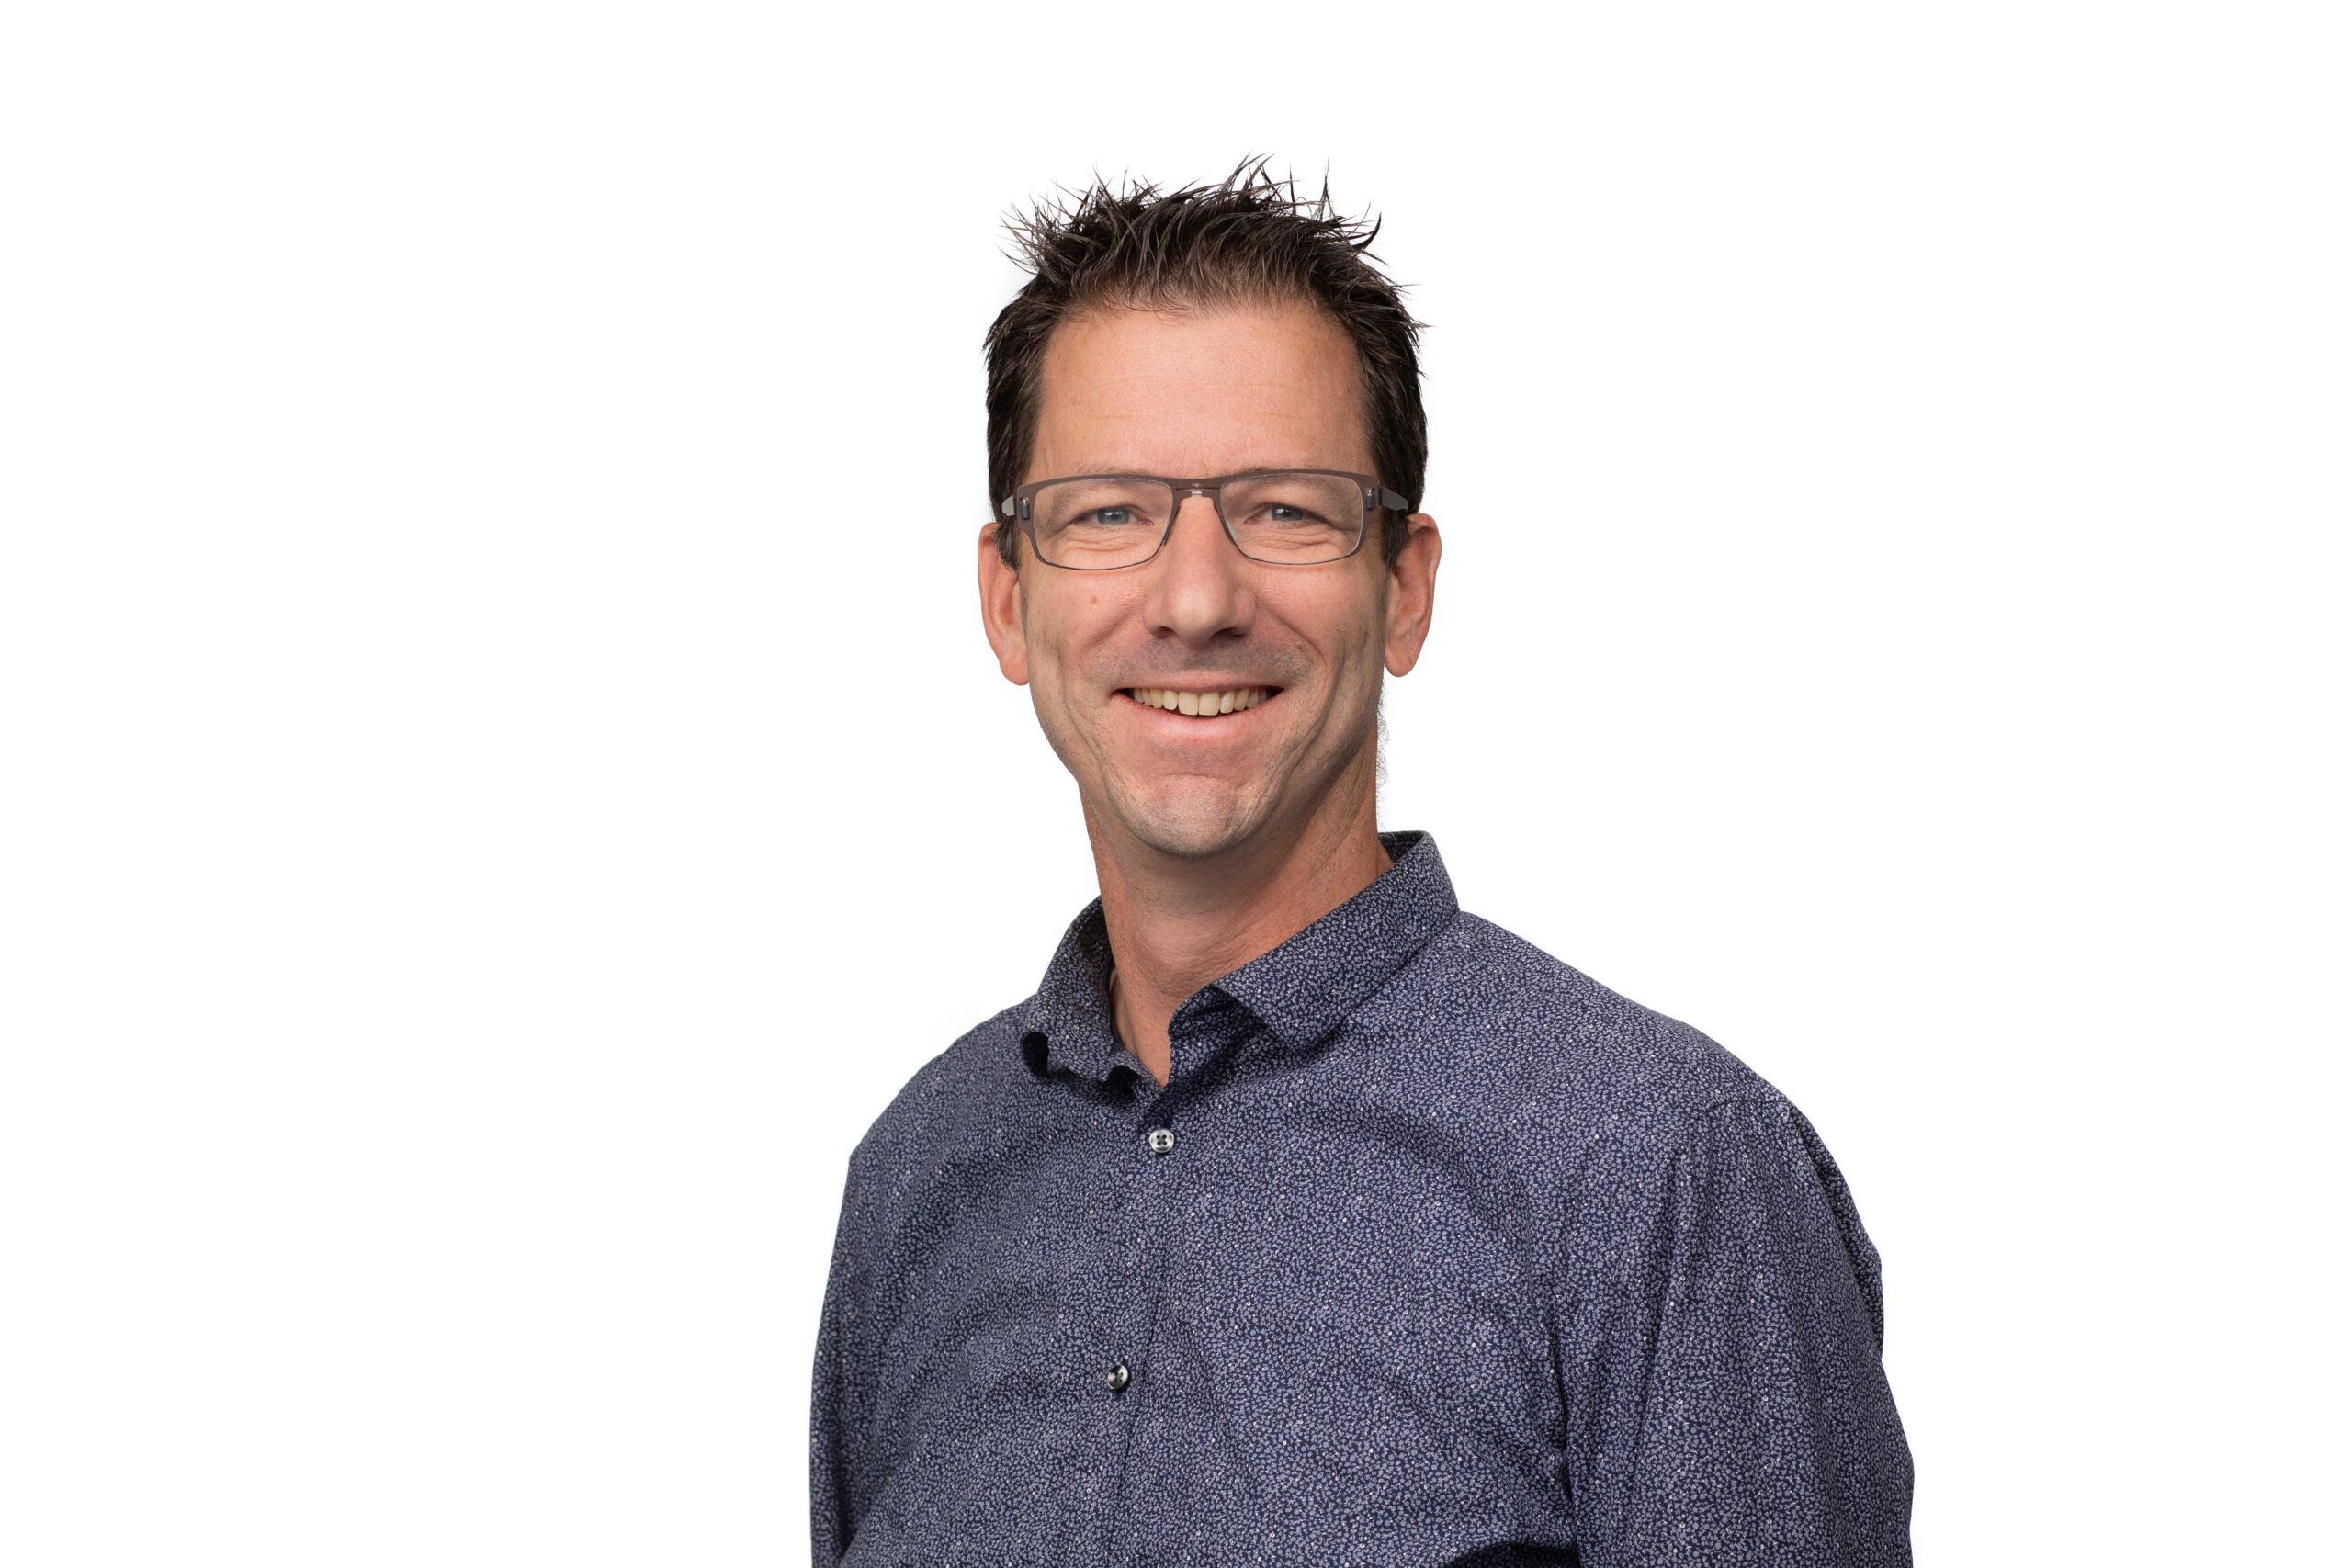 photo Martijn van der Meulen